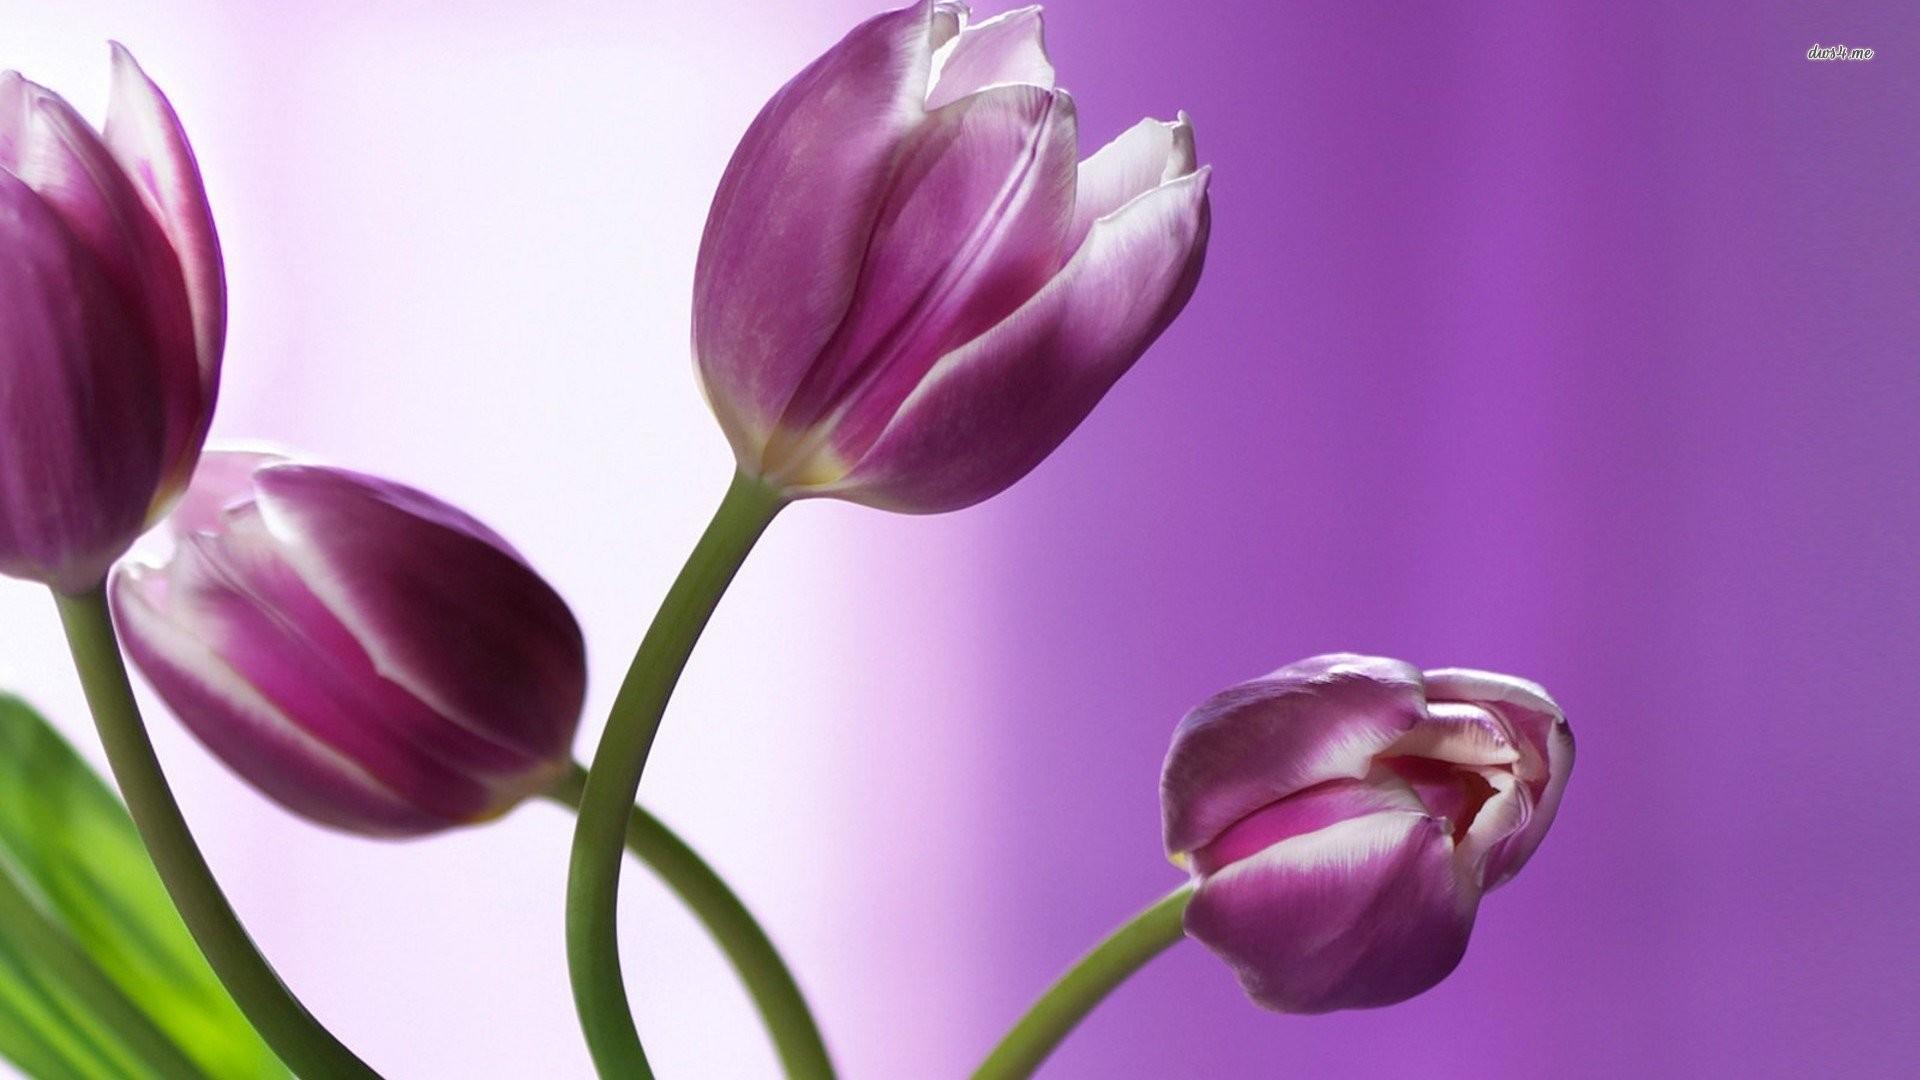 Purple And White Tulips 821369